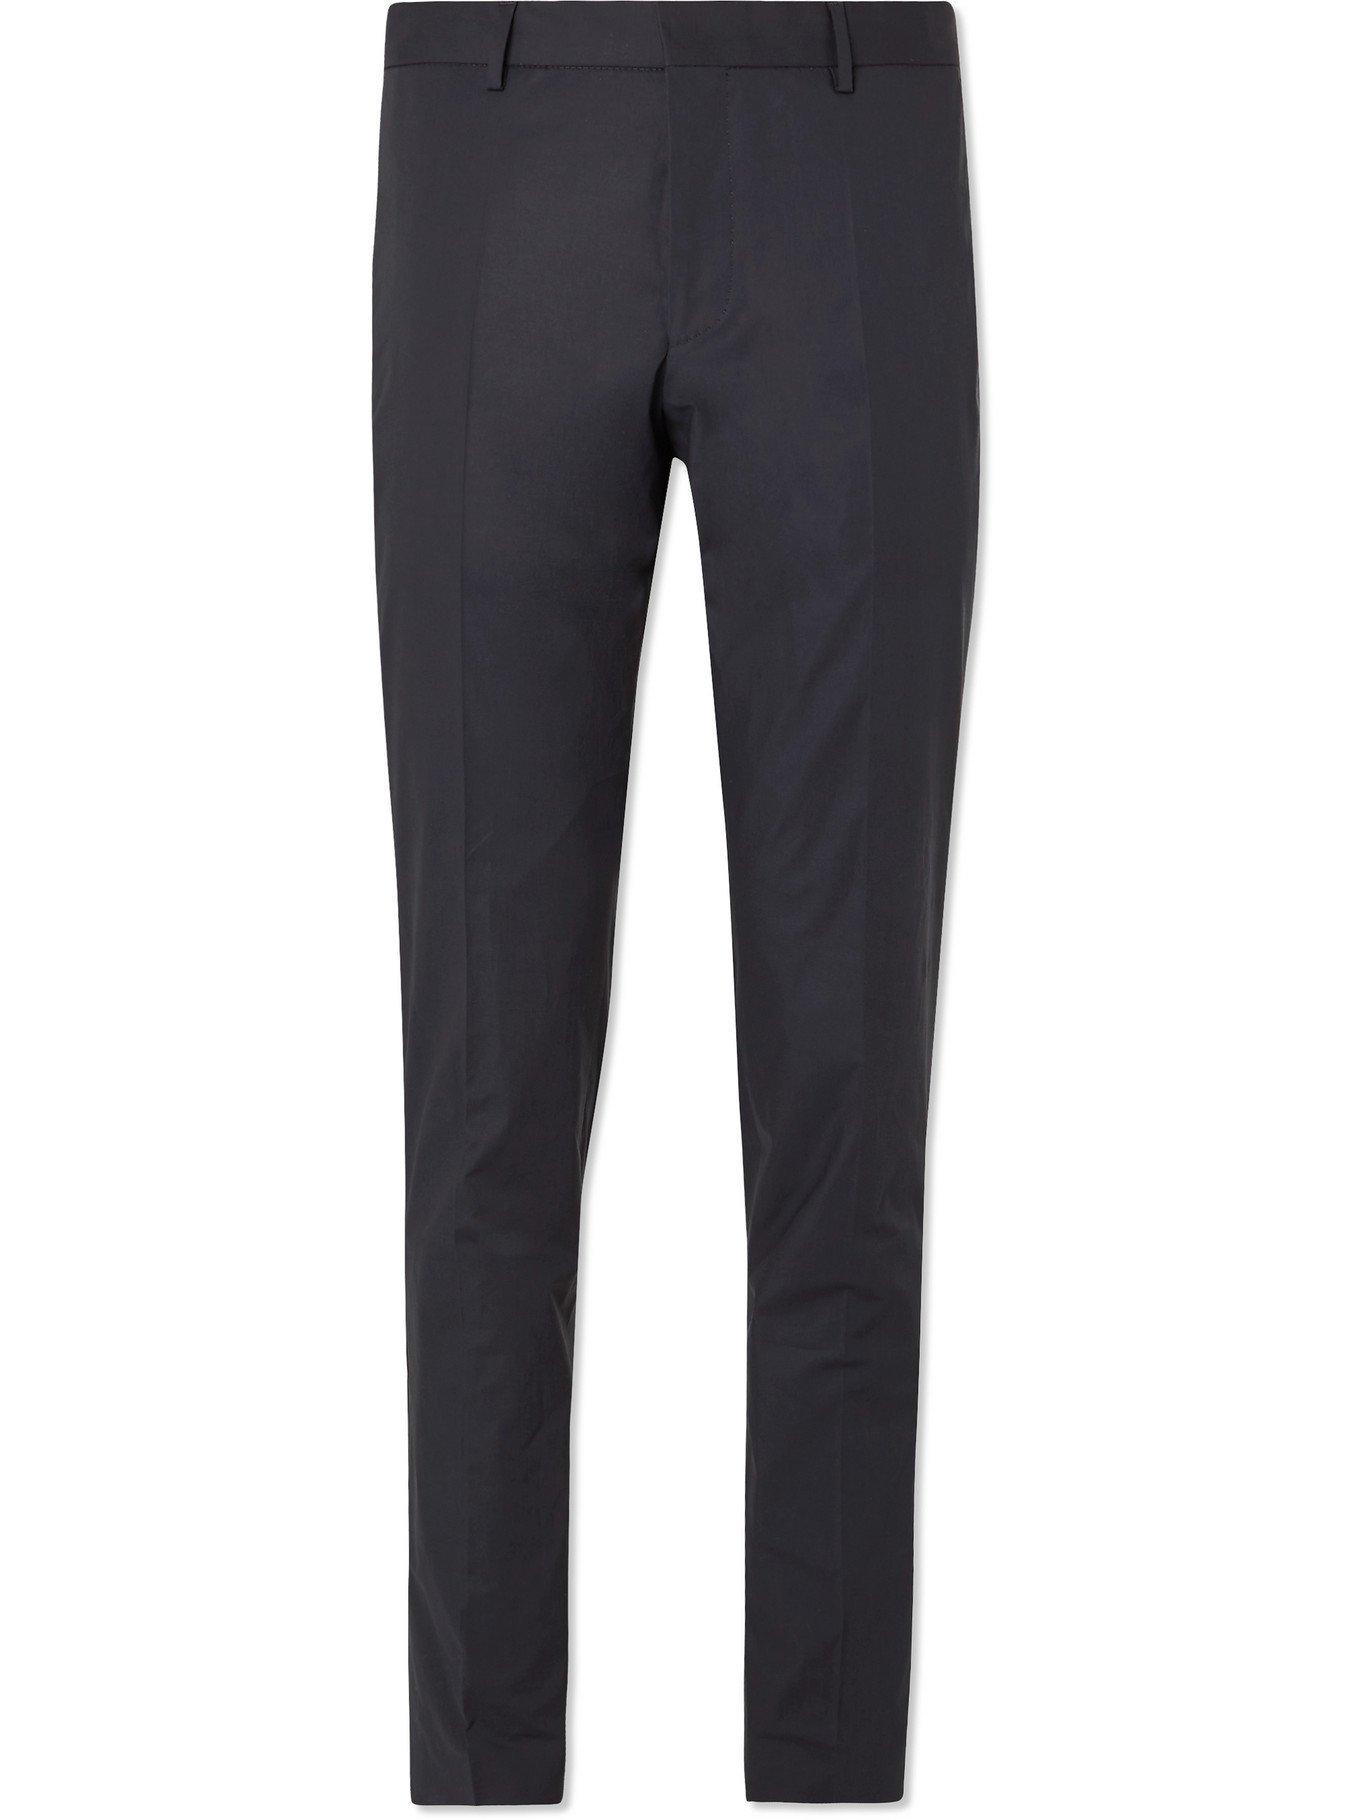 HUGO BOSS - Slim-Fit Stretch-Cotton Suit Trousers - Blue